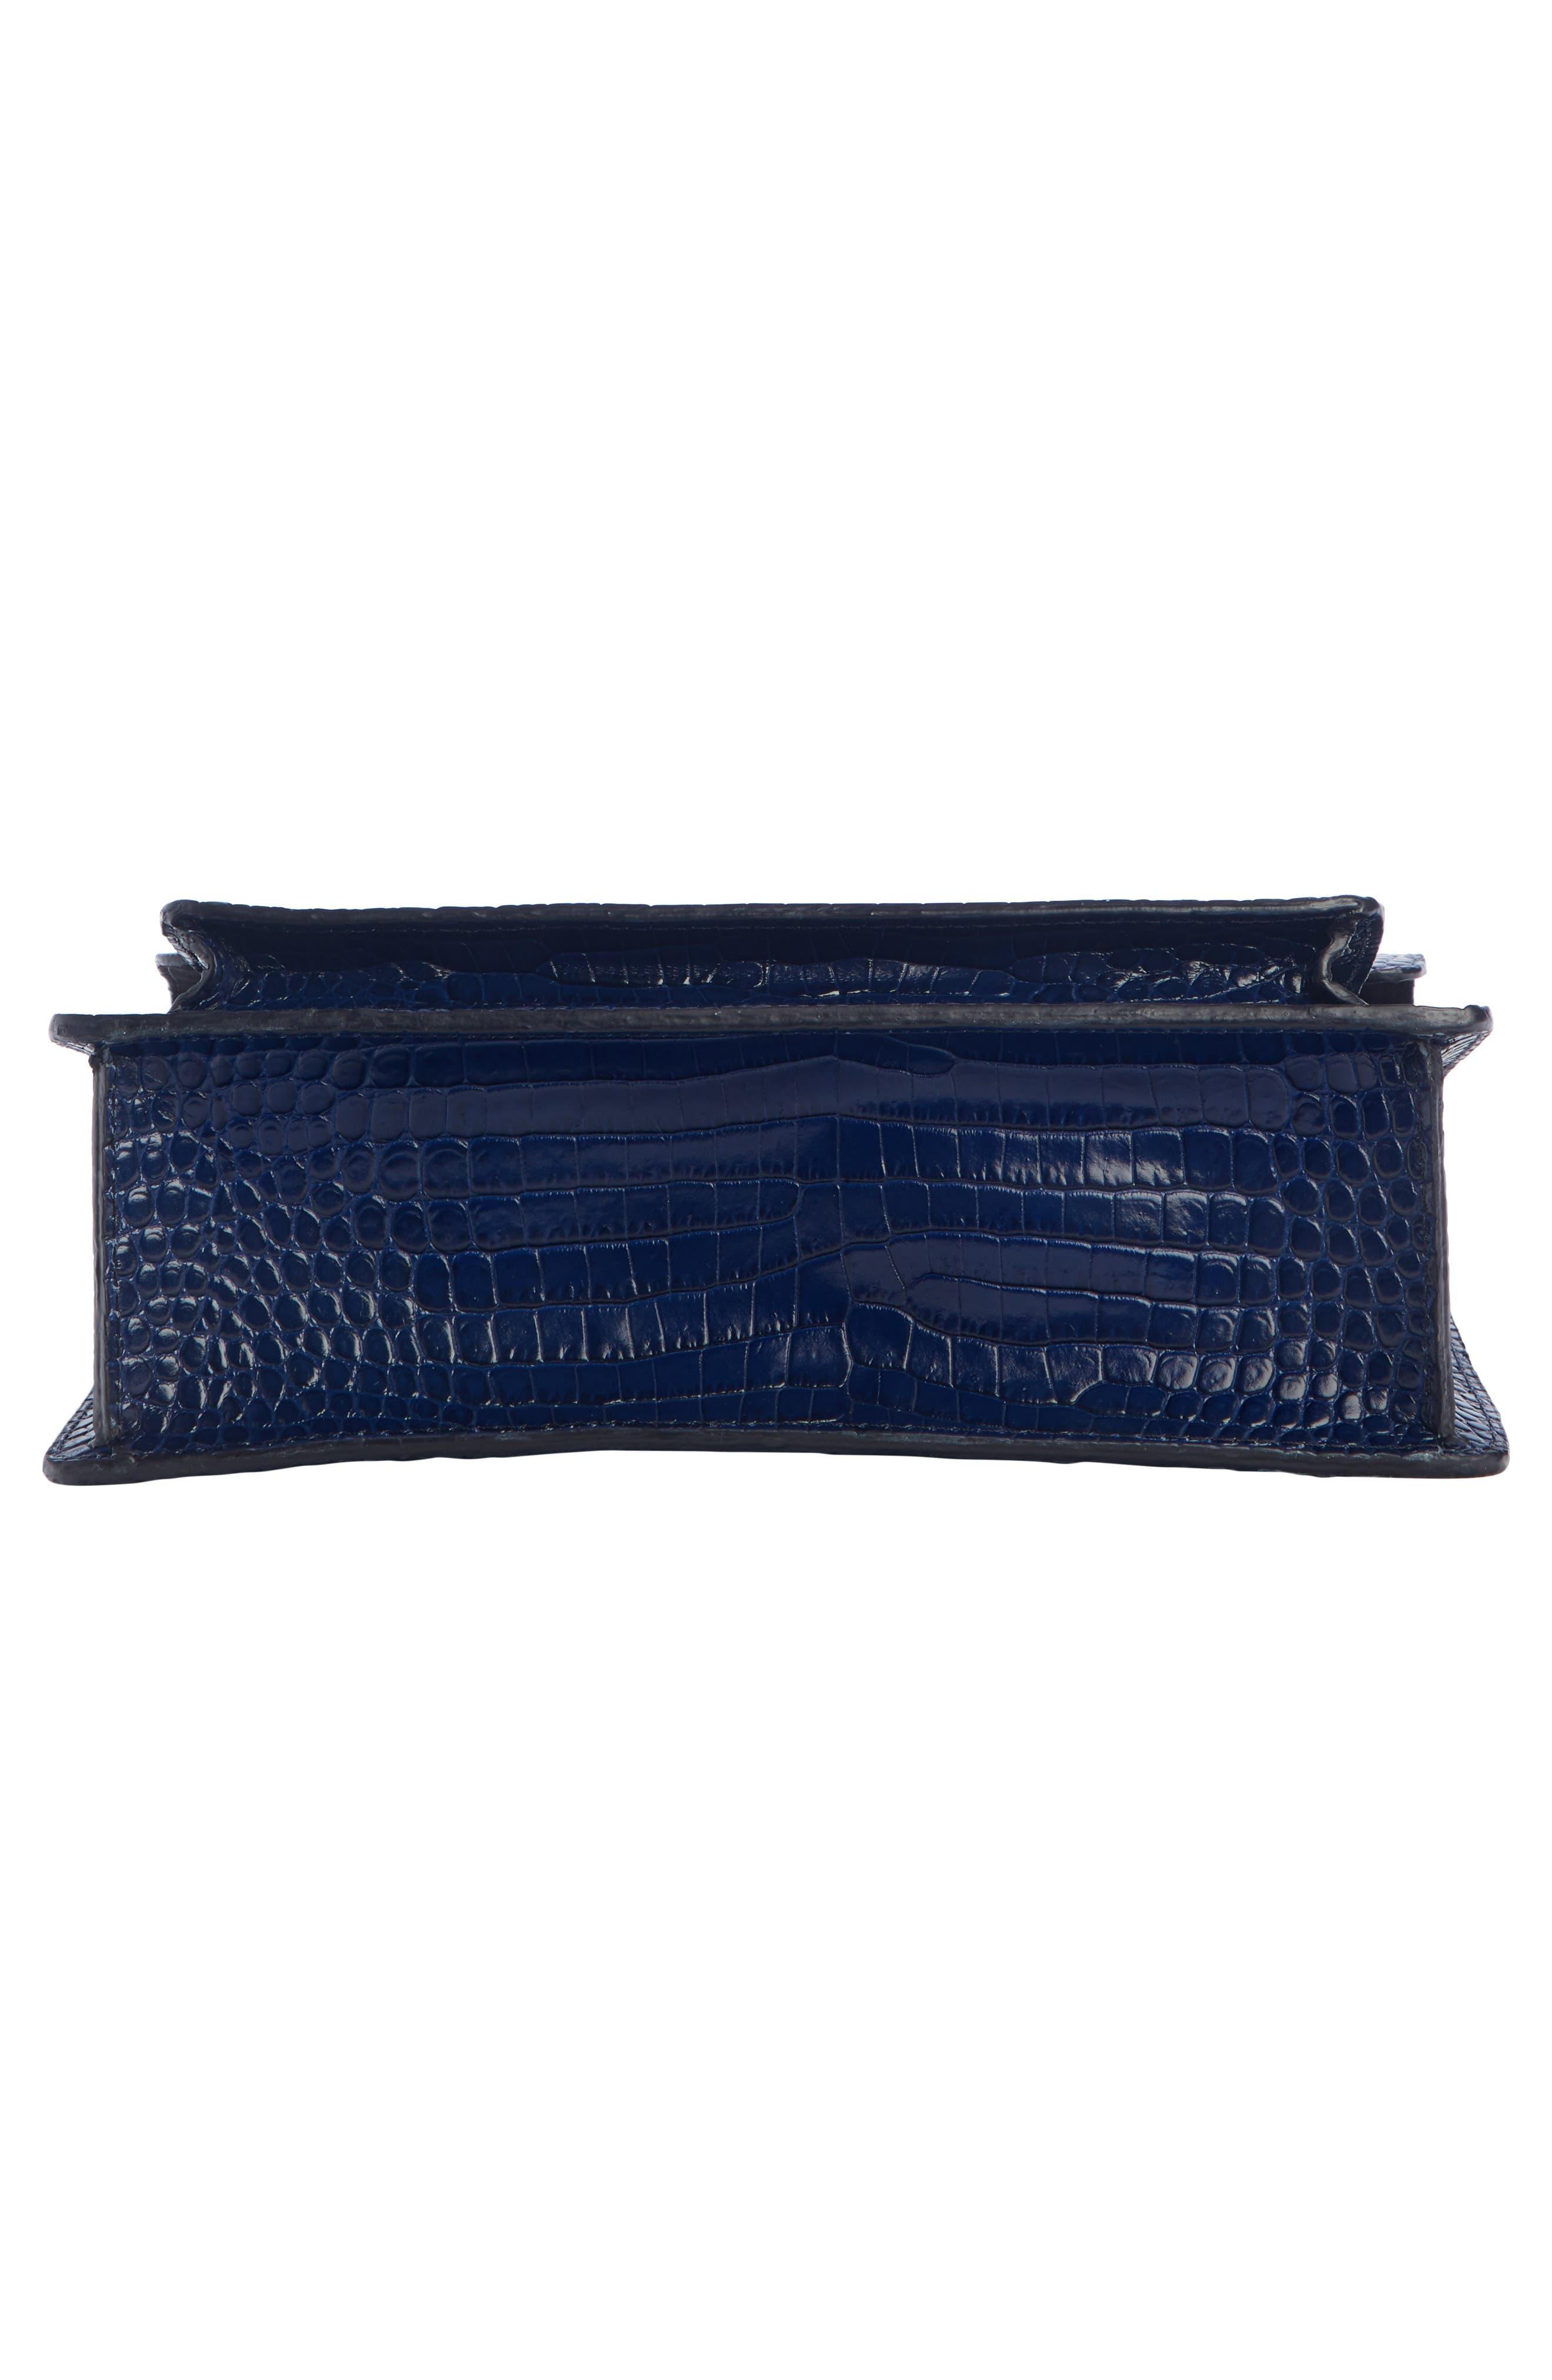 DRIES VAN NOTEN, Croc Embossed Leather Crossbody Bag, Alternate thumbnail 4, color, BLUE